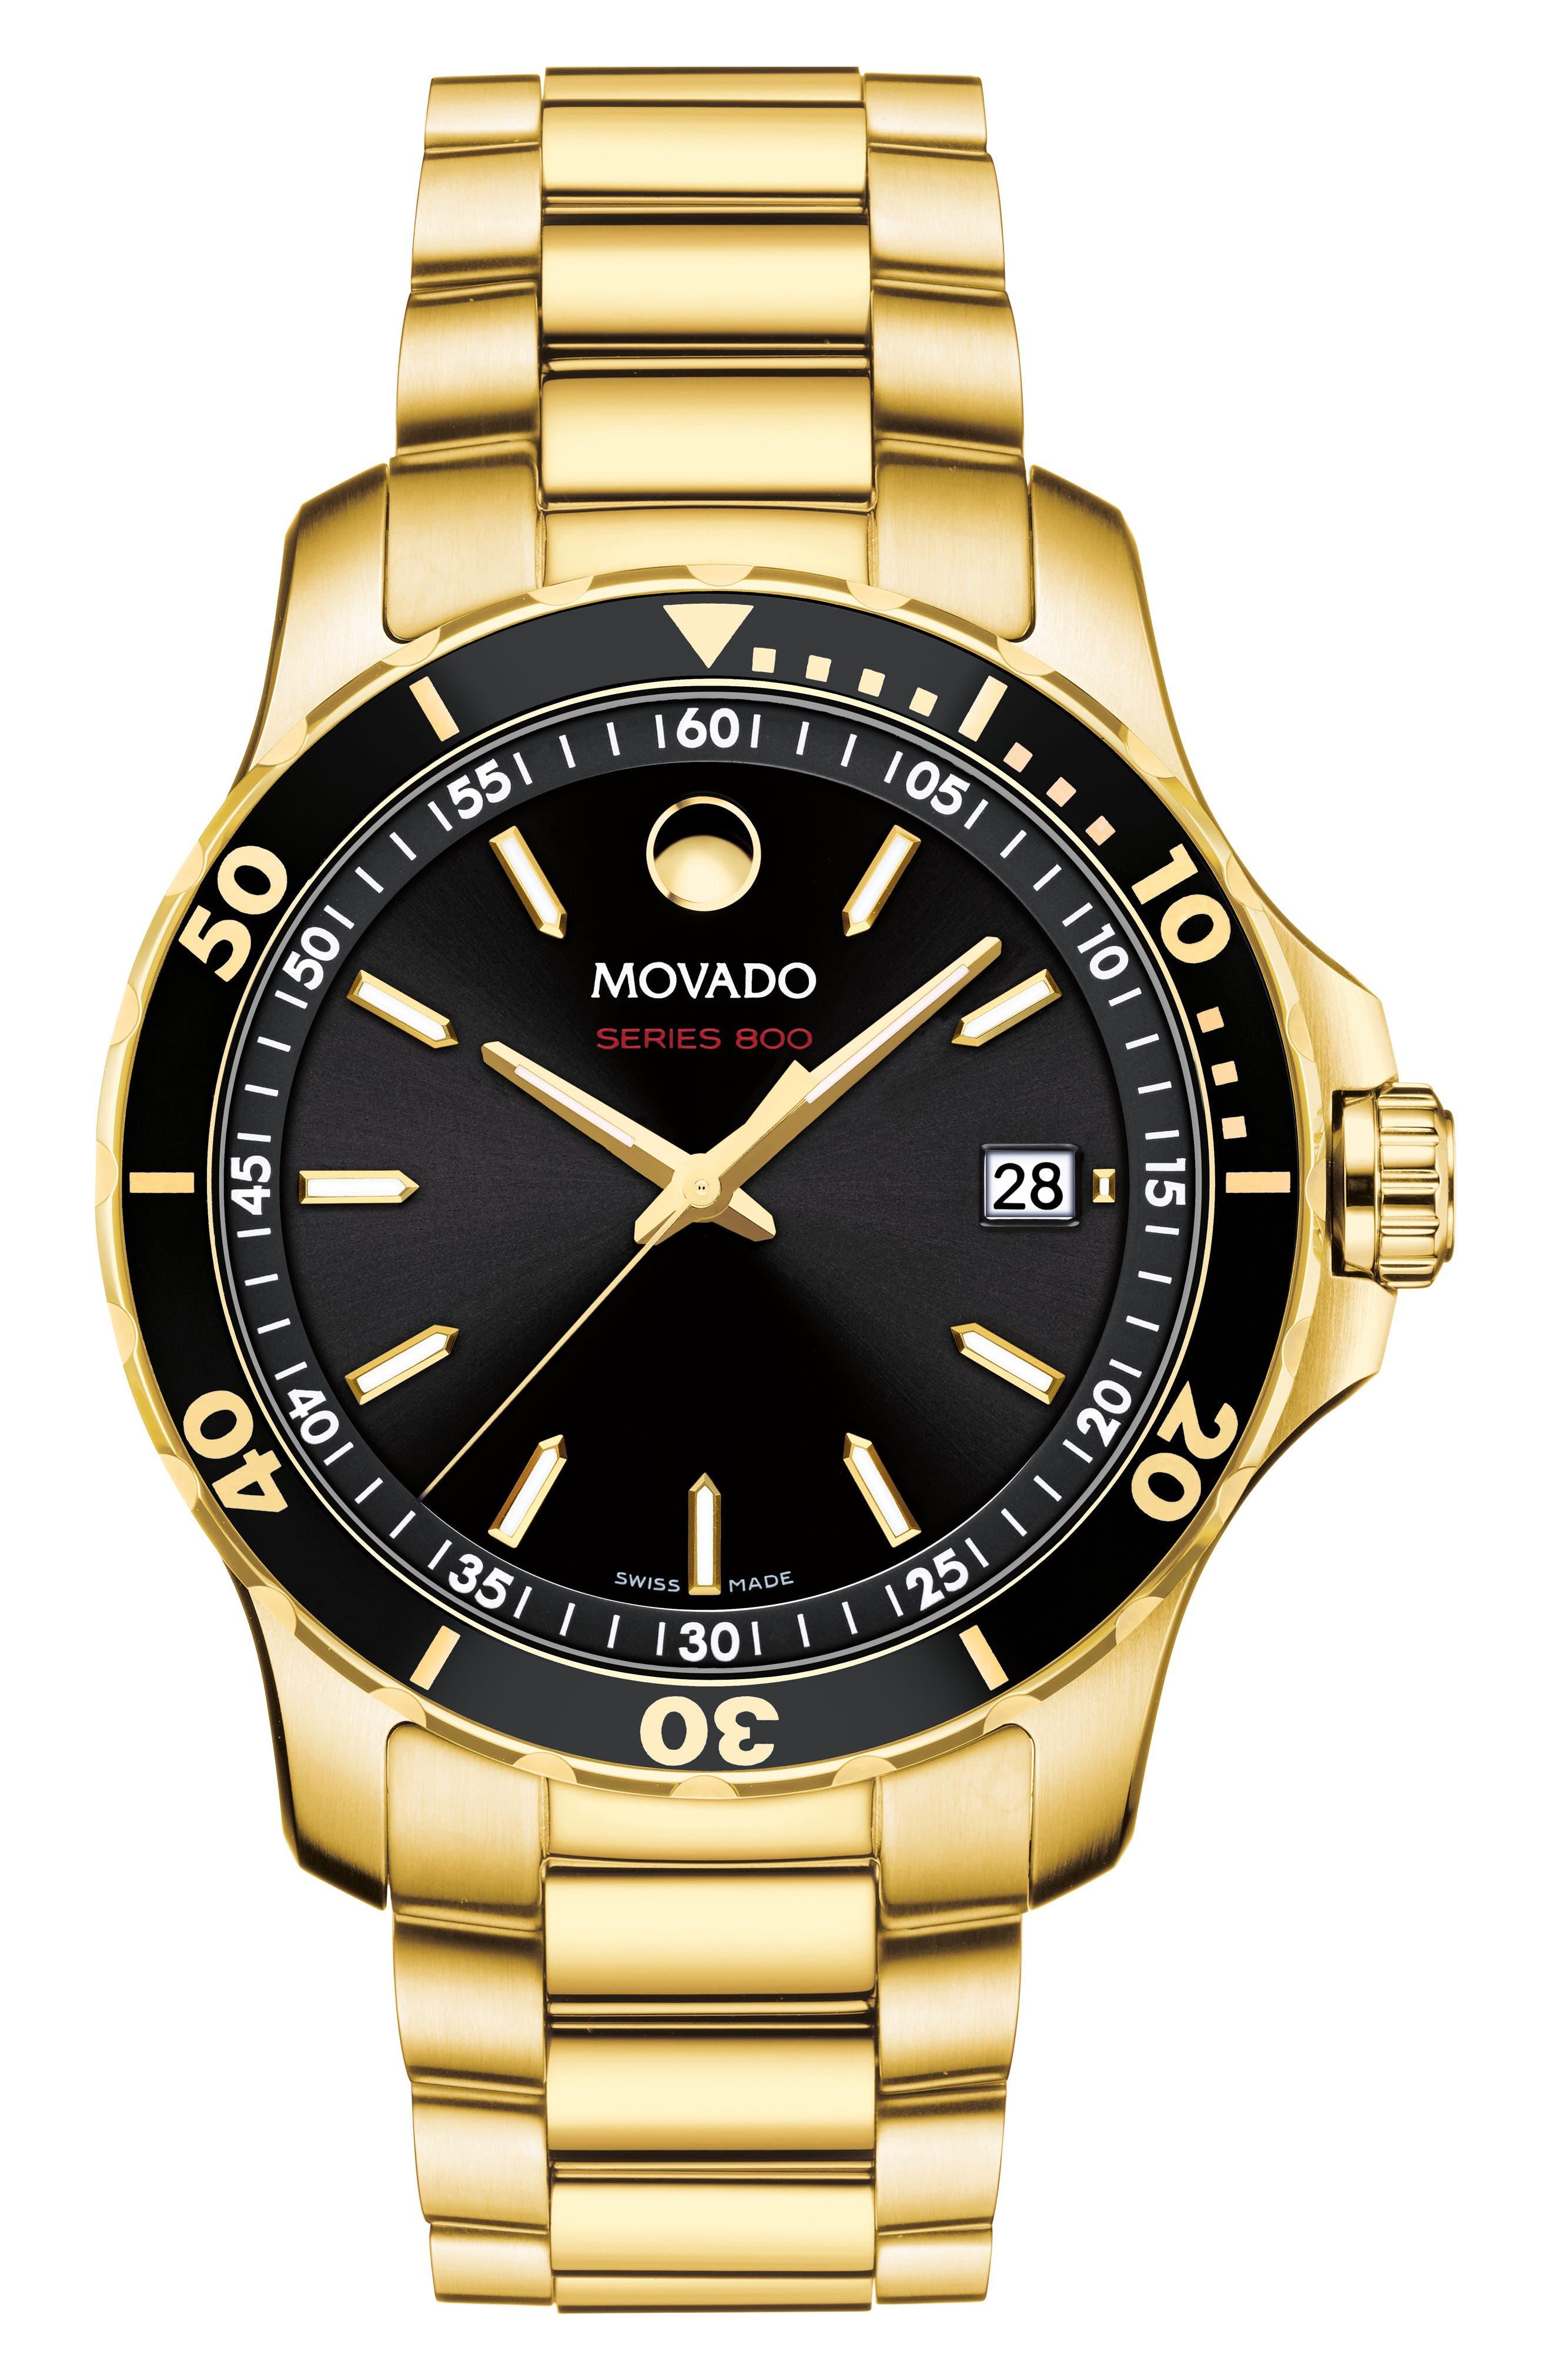 Main Image - Movado Series 800 Bracelet Watch, 40mm